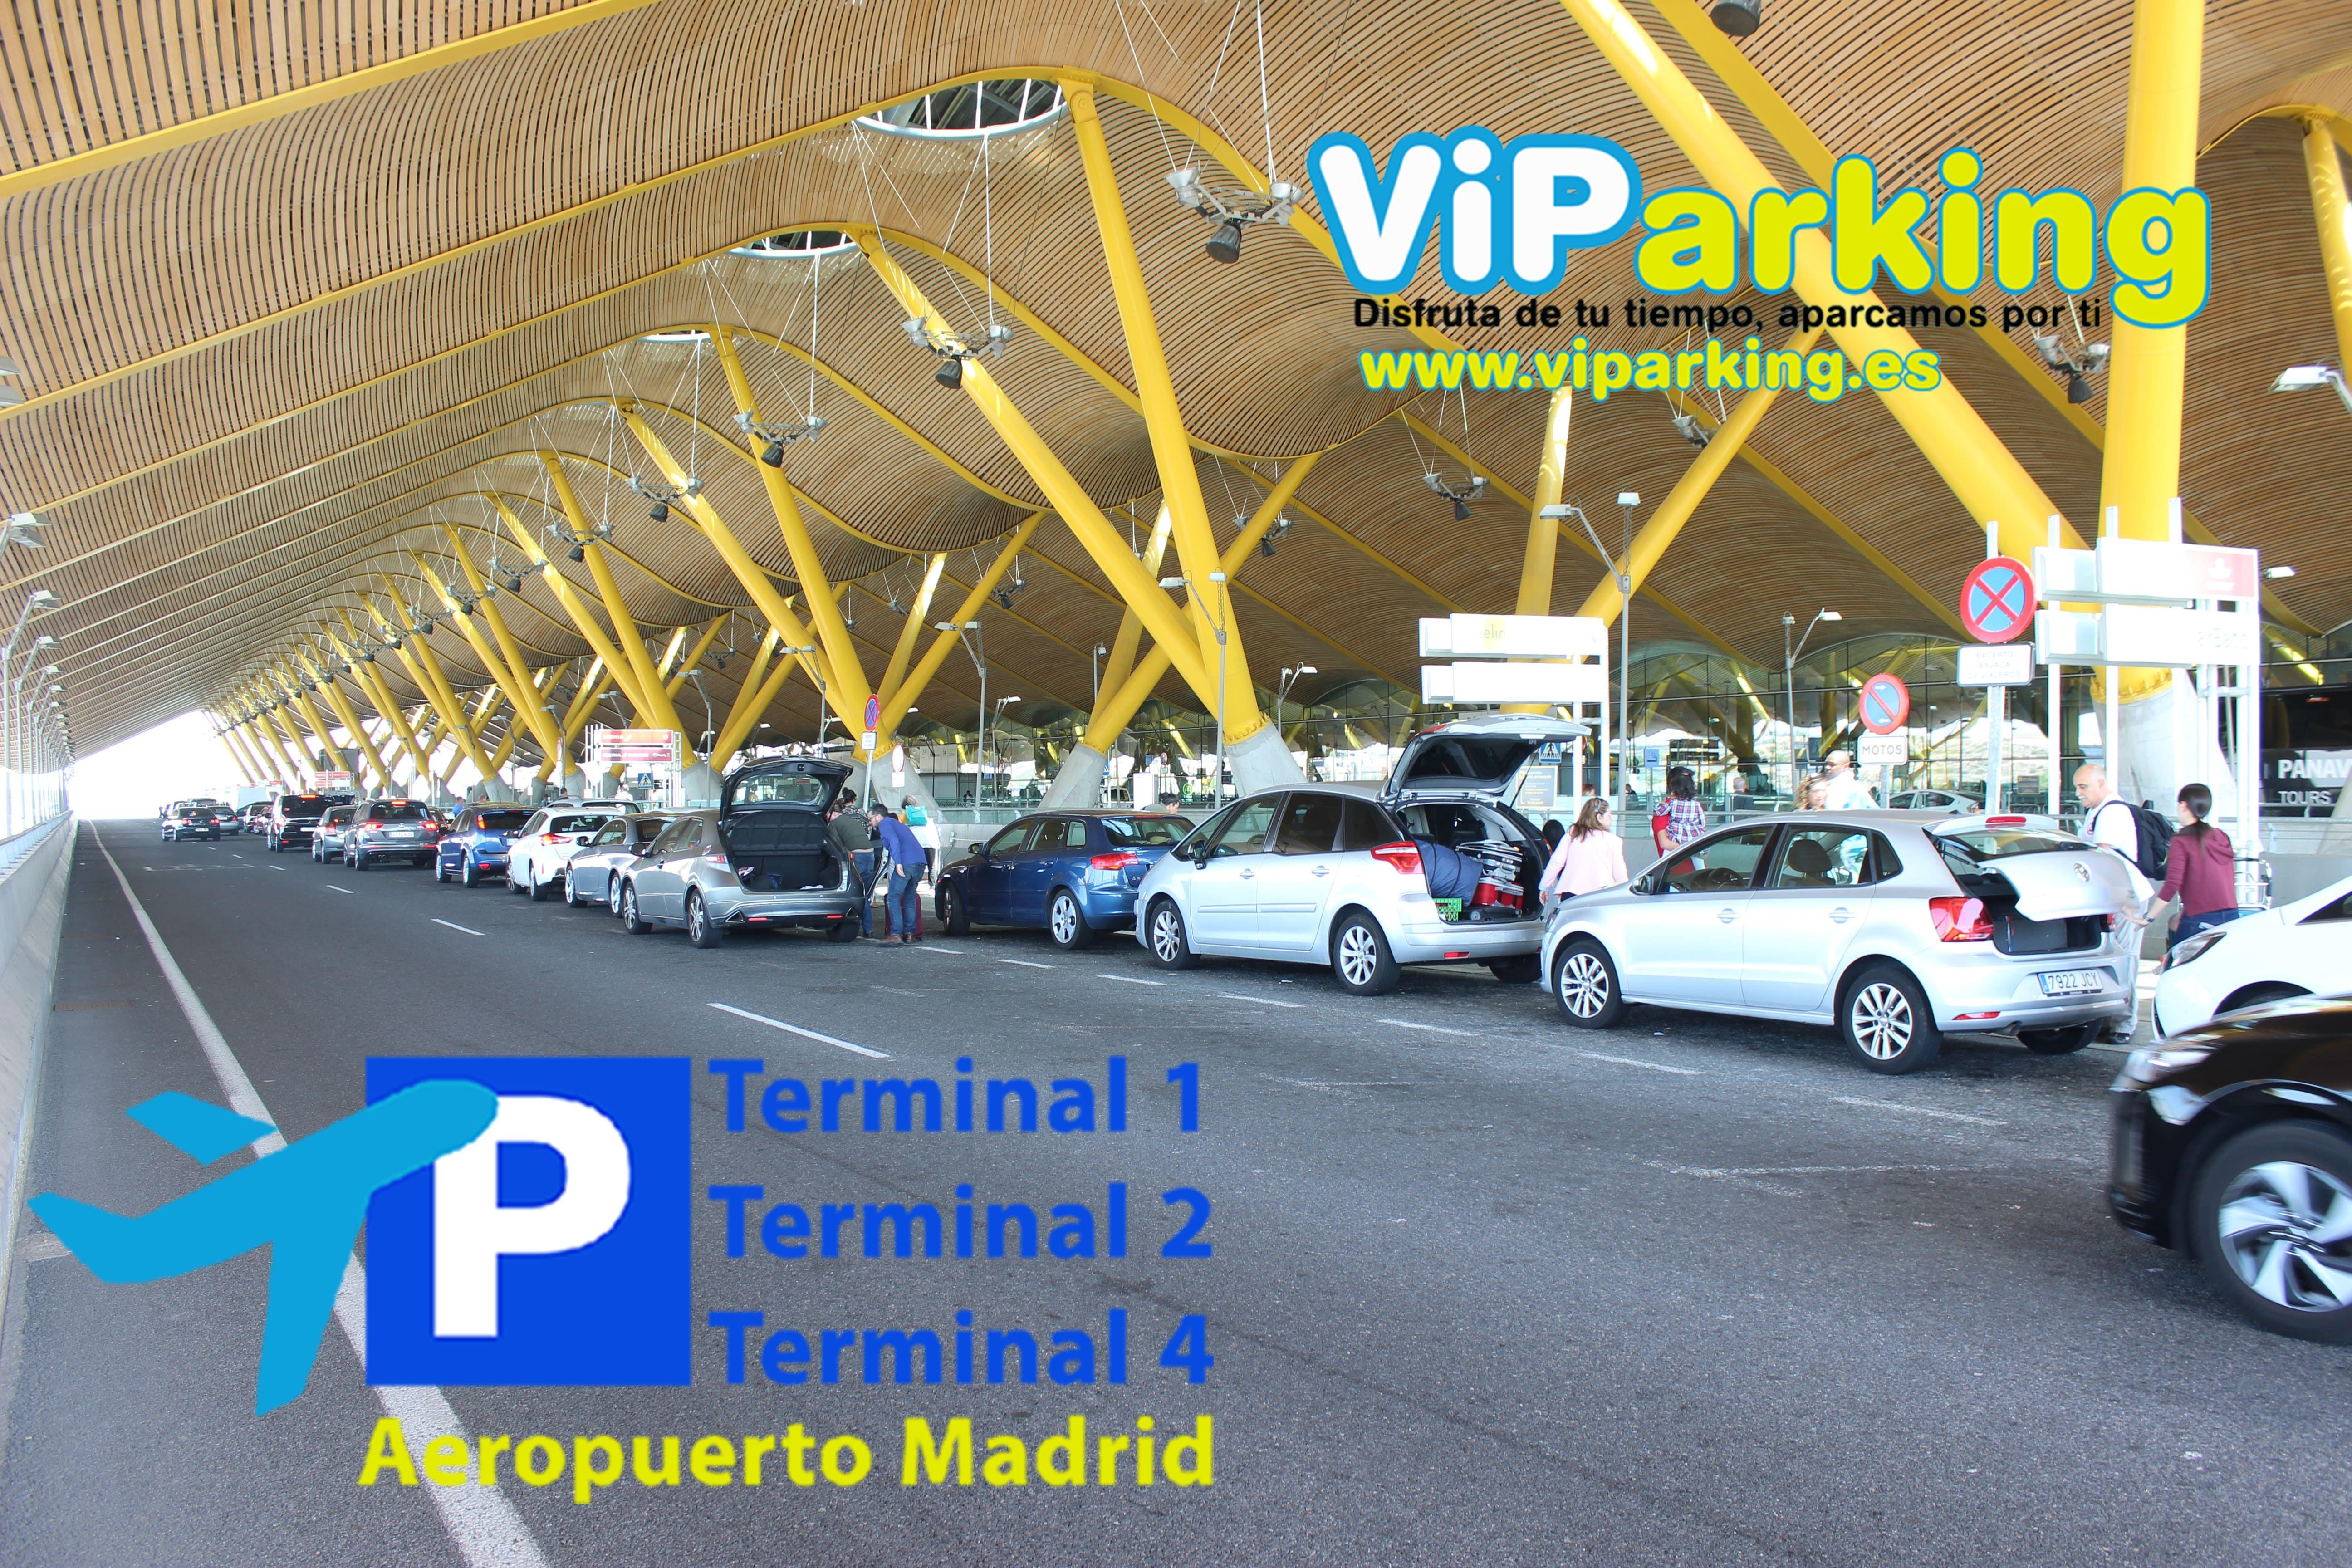 Parking Aeropuerto Madrid T4 Parking Aeropuerto Madre